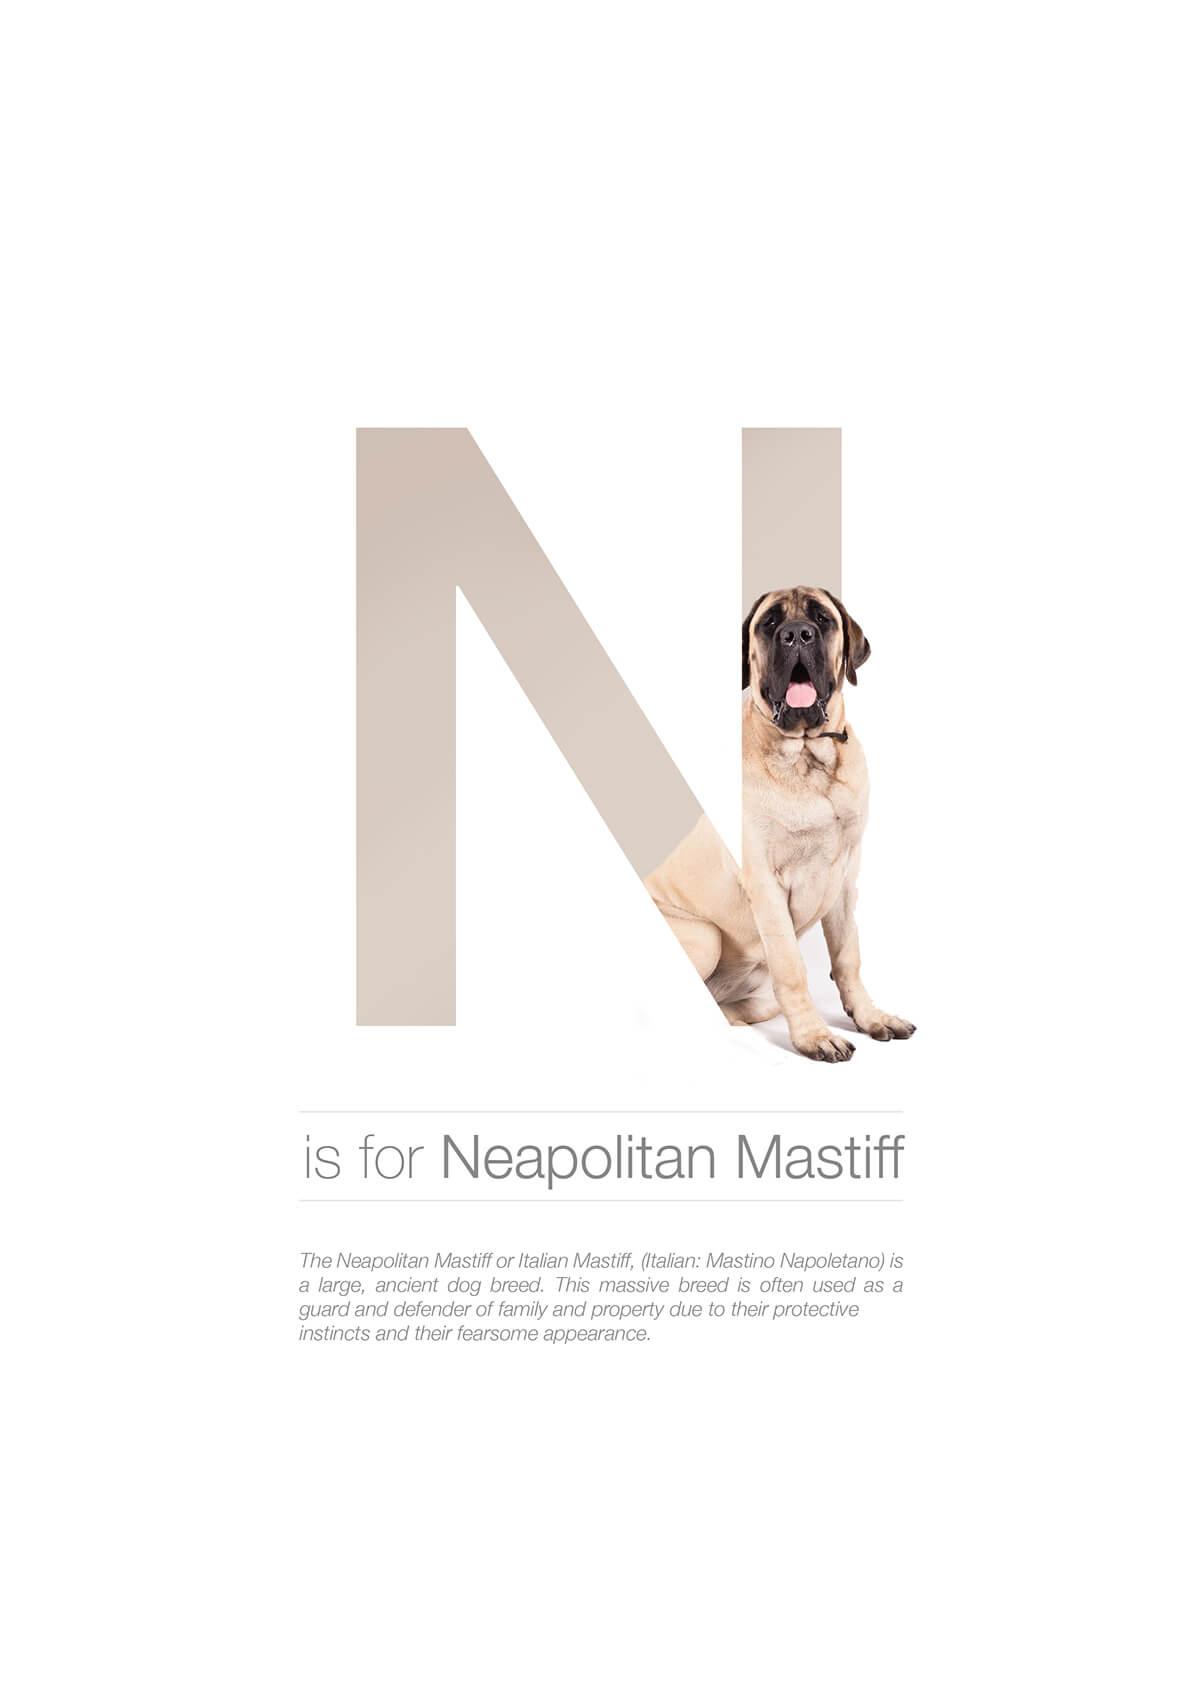 N ตัวอักษรกราฟฟิค A Z สายพันธุ์หมาไอเดียน่ารักจากดีไซน์เนอร์โรมาเนีย